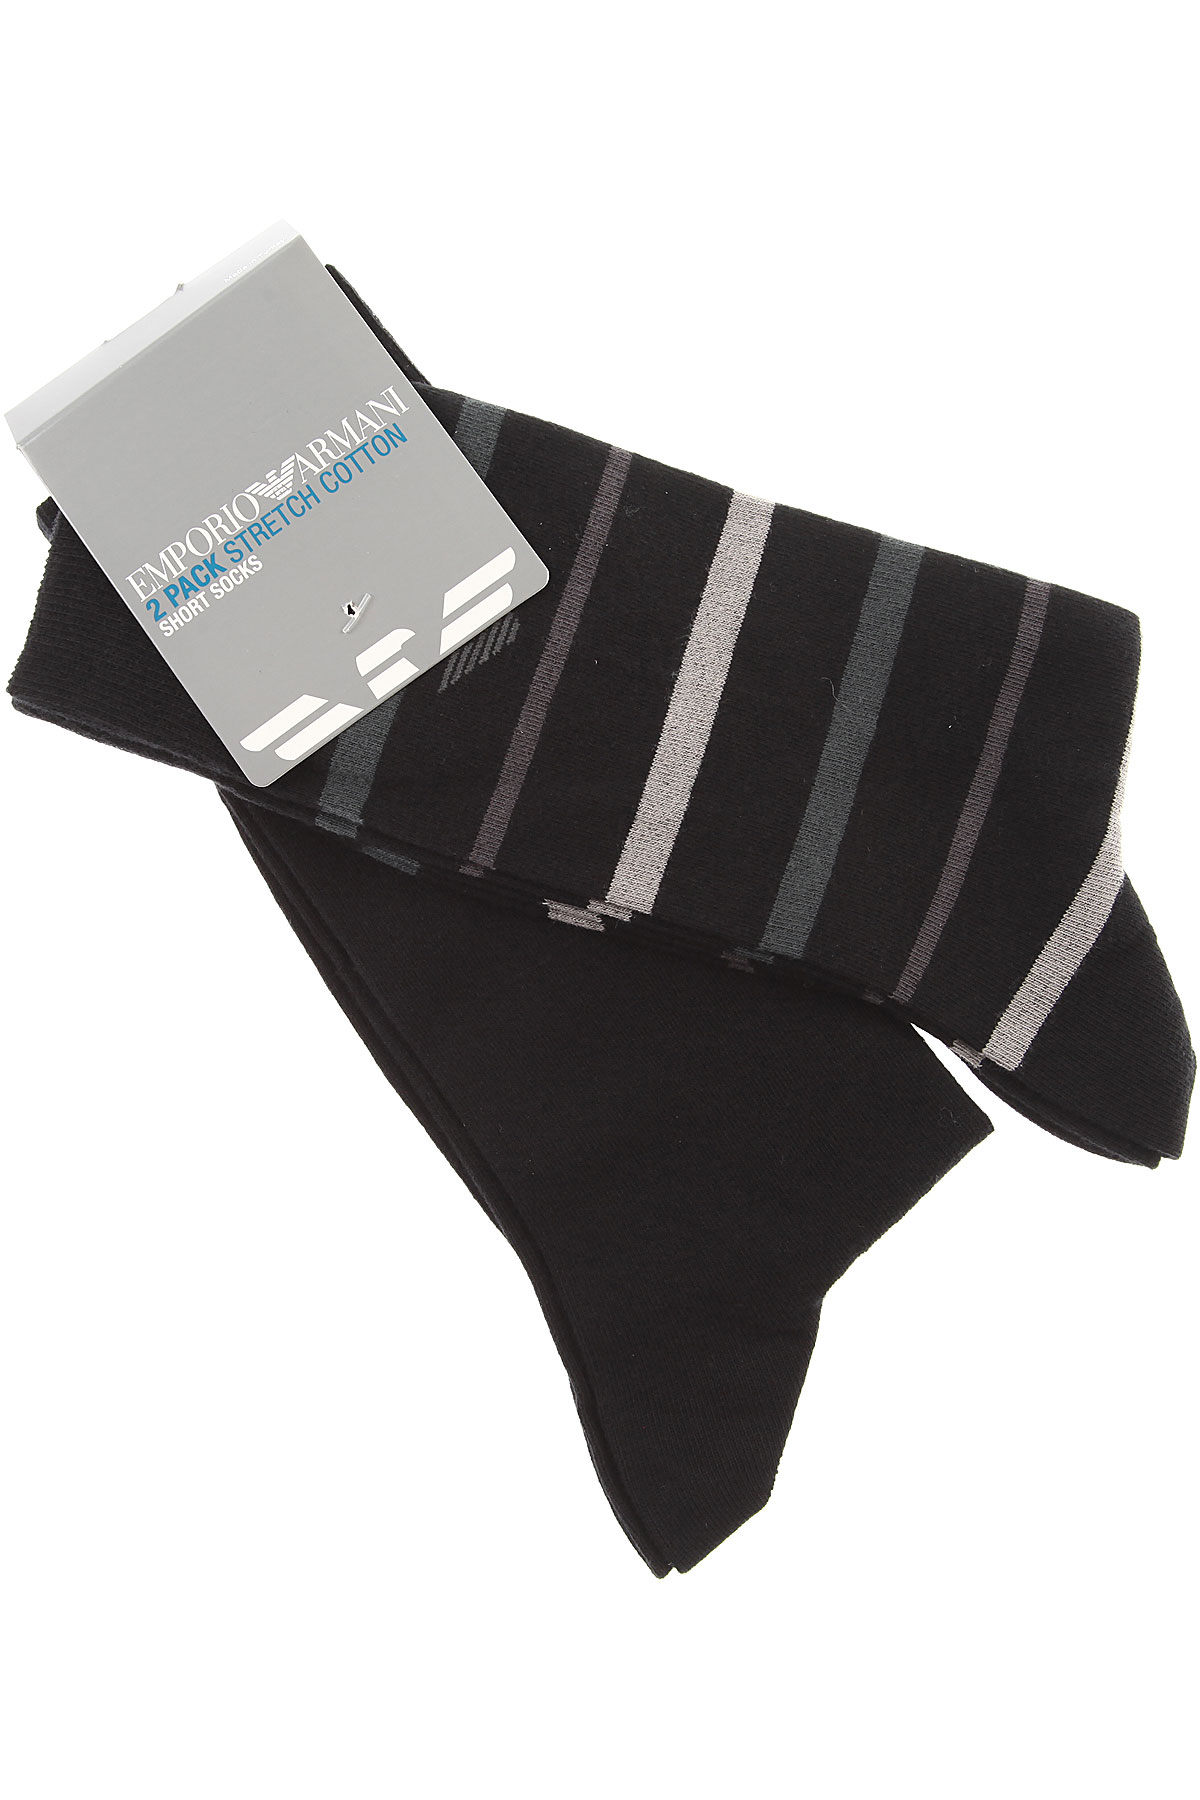 Image of Emporio Armani Socks Socks for Men, 2 Pack, Black, Cotton, 2017